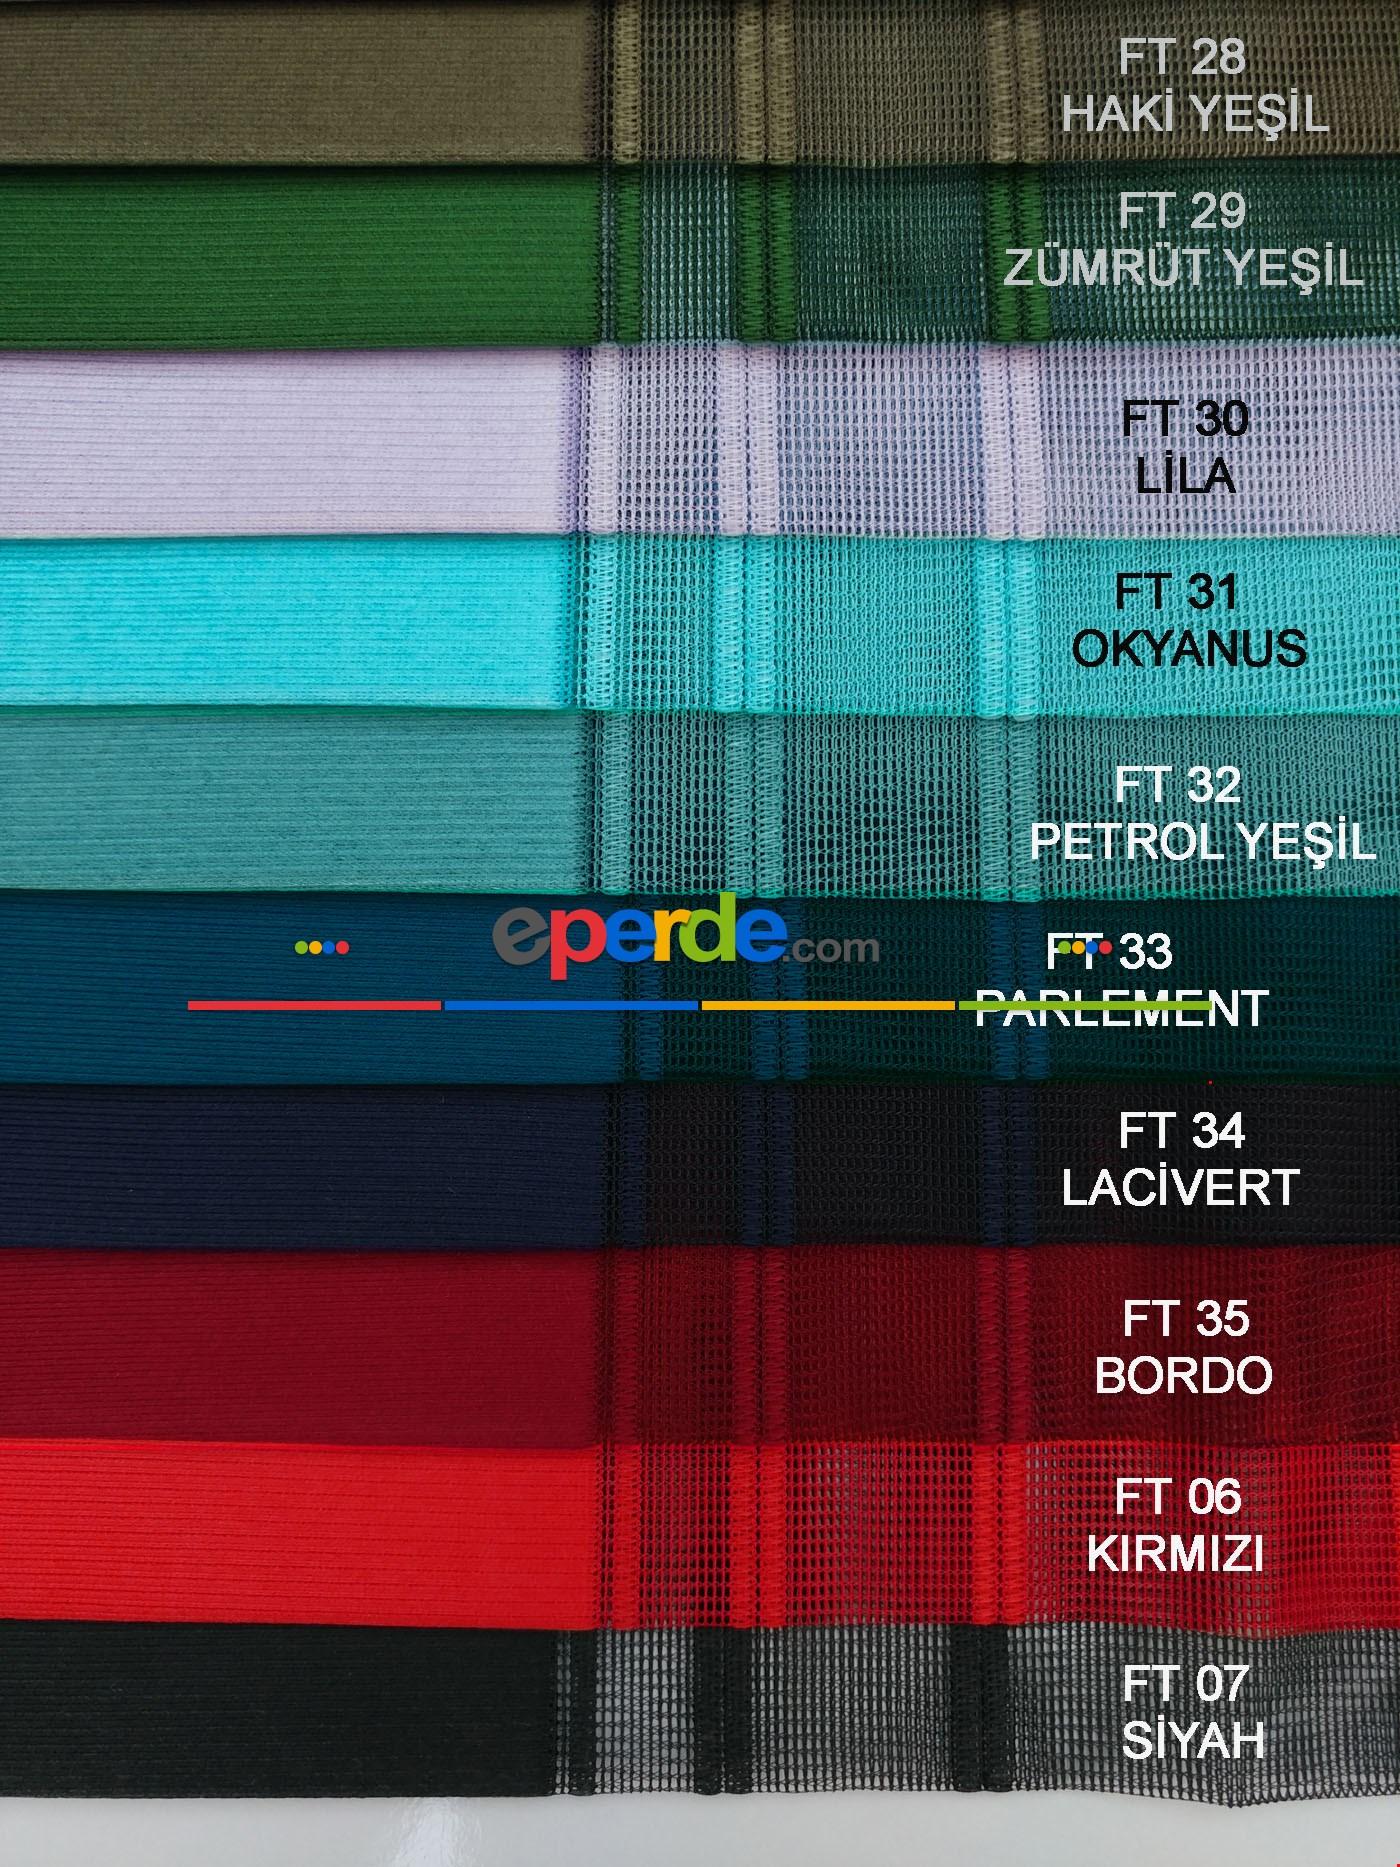 1. Kalite Çizgili Tül Dikey Zebra Perde - Ft14 Füme, Ft13 Gri, Ft16 Hardal Sarı, Ft02 Ekru